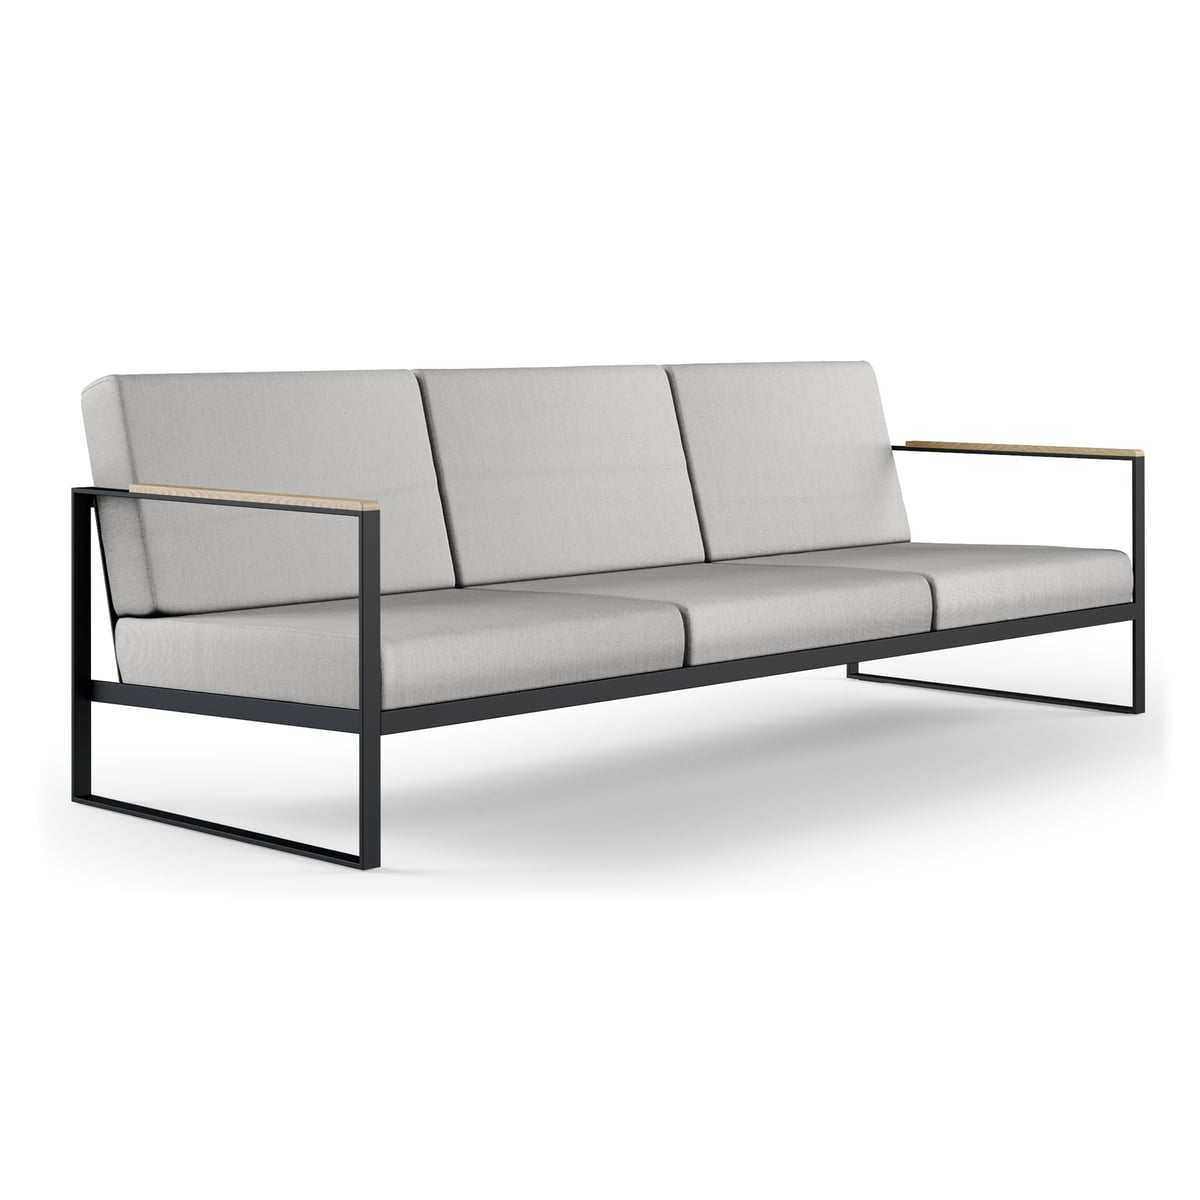 Full Size of 3 Sitzer Sofa Roller Mit Bettfunktion Ikea Schlaffunktion Grau Couch Leder Und 2 Sessel Relaxfunktion Poco Rot Bettkasten Klippan Bei Federkern Sofort Sofa 3 Sitzer Sofa